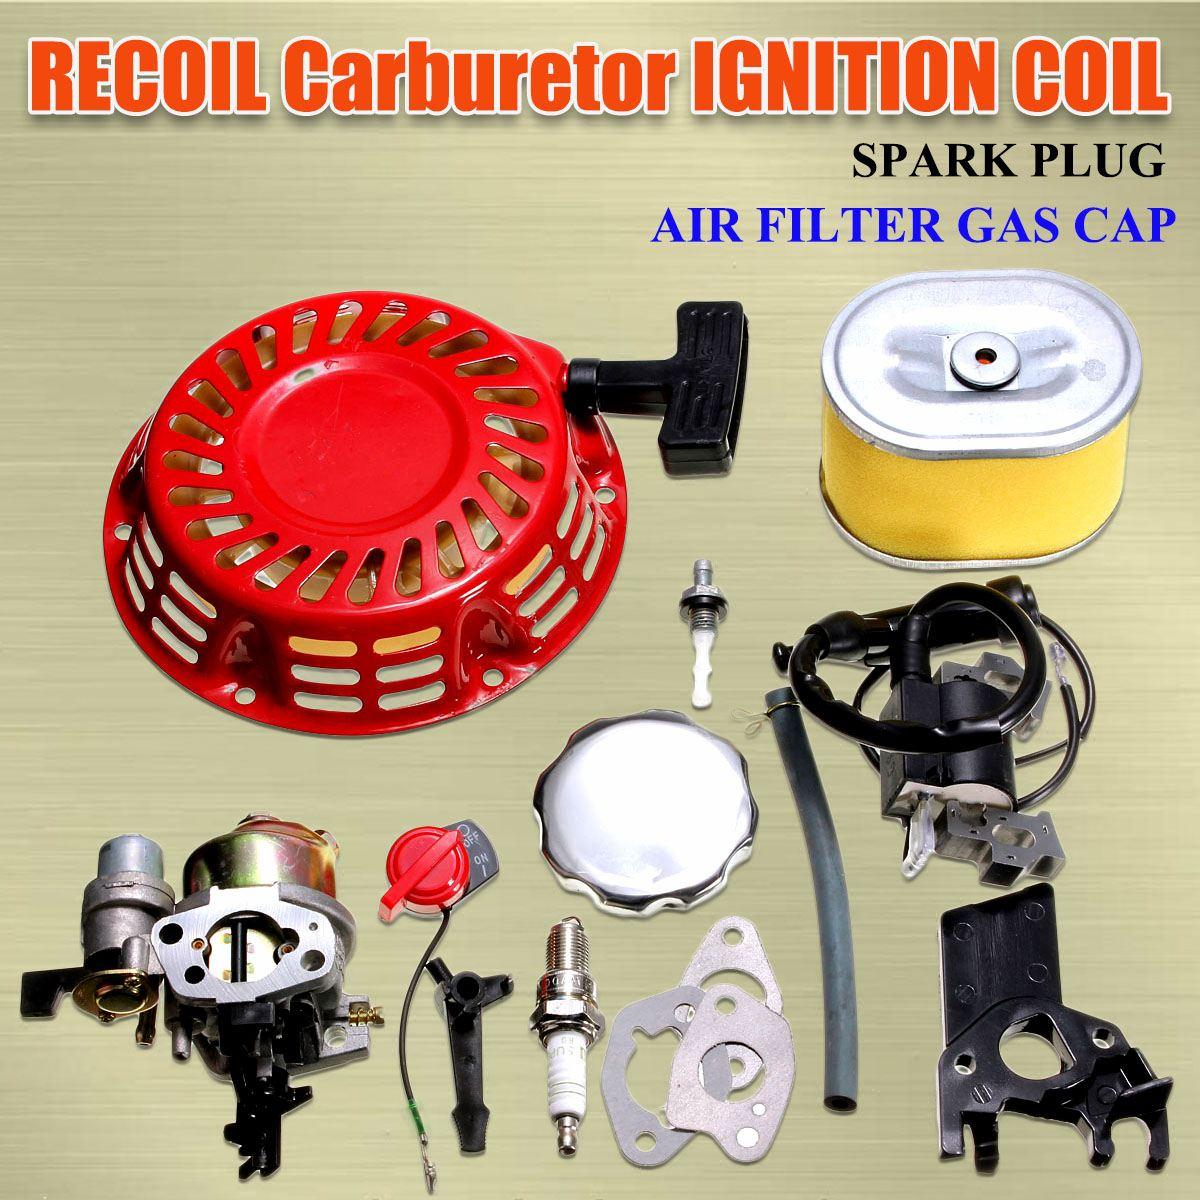 HONDA GX160 GX200 RECOIL CARBURETOR IGNITION COIL SPARK PLUG AIR FILTER GAS CAP